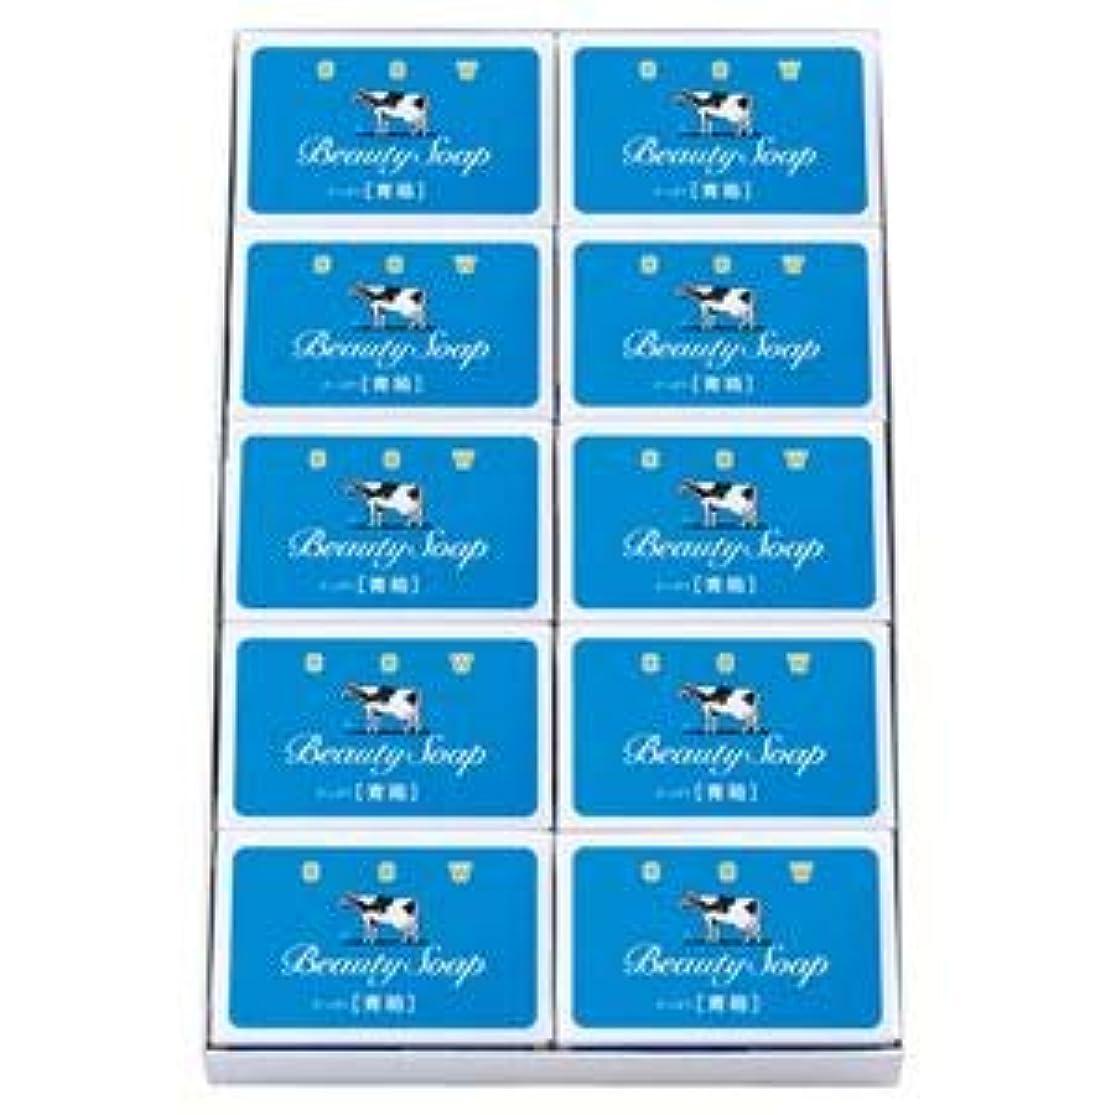 【COW 牛乳石鹸 カウブランド】 ギフトセット/石けんセット 【青箱 10個入り】 化粧箱入 日本製 〔お中元 お歳暮 内祝い〕【代引不可】